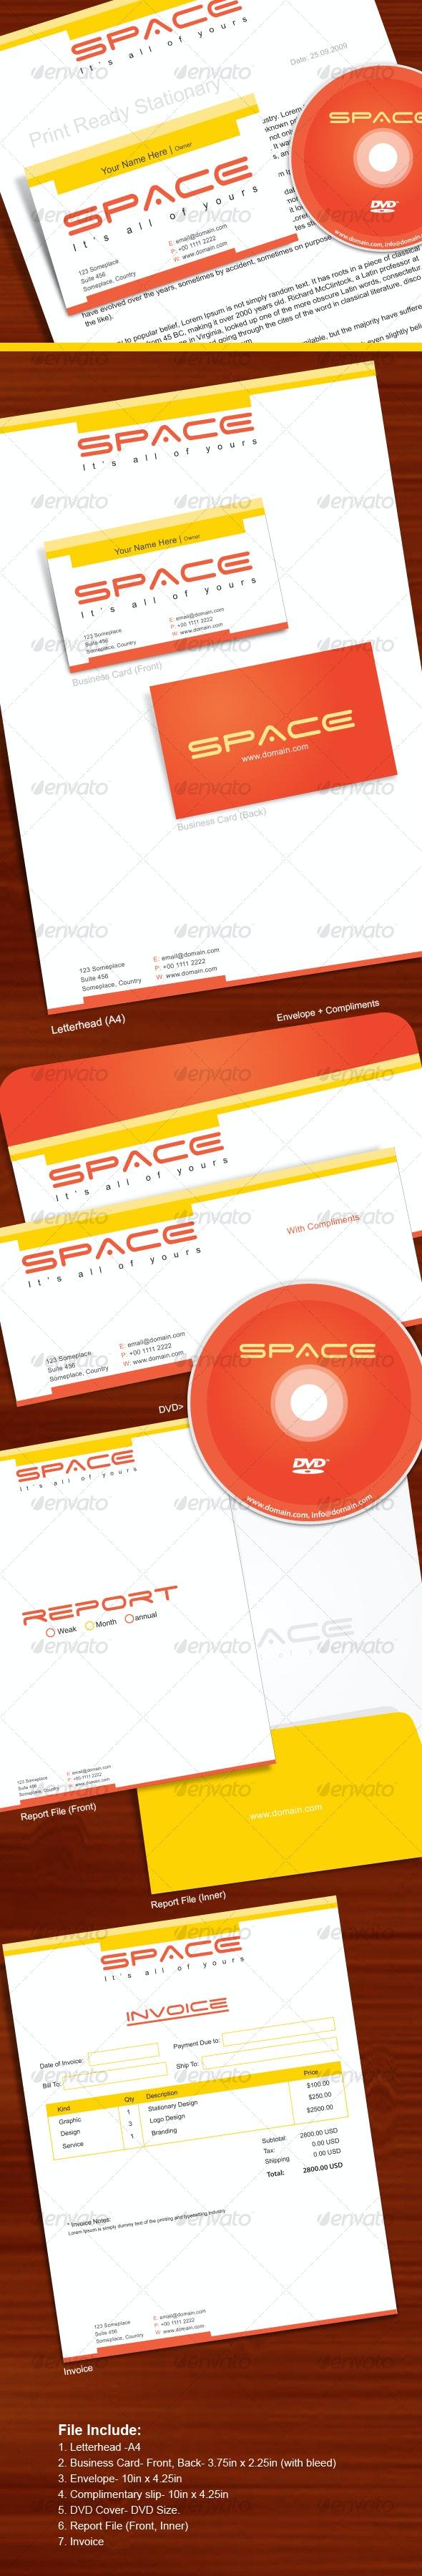 Rrint-Ready-Full-Stationary-Set 7 Item - Stationery Print Templates